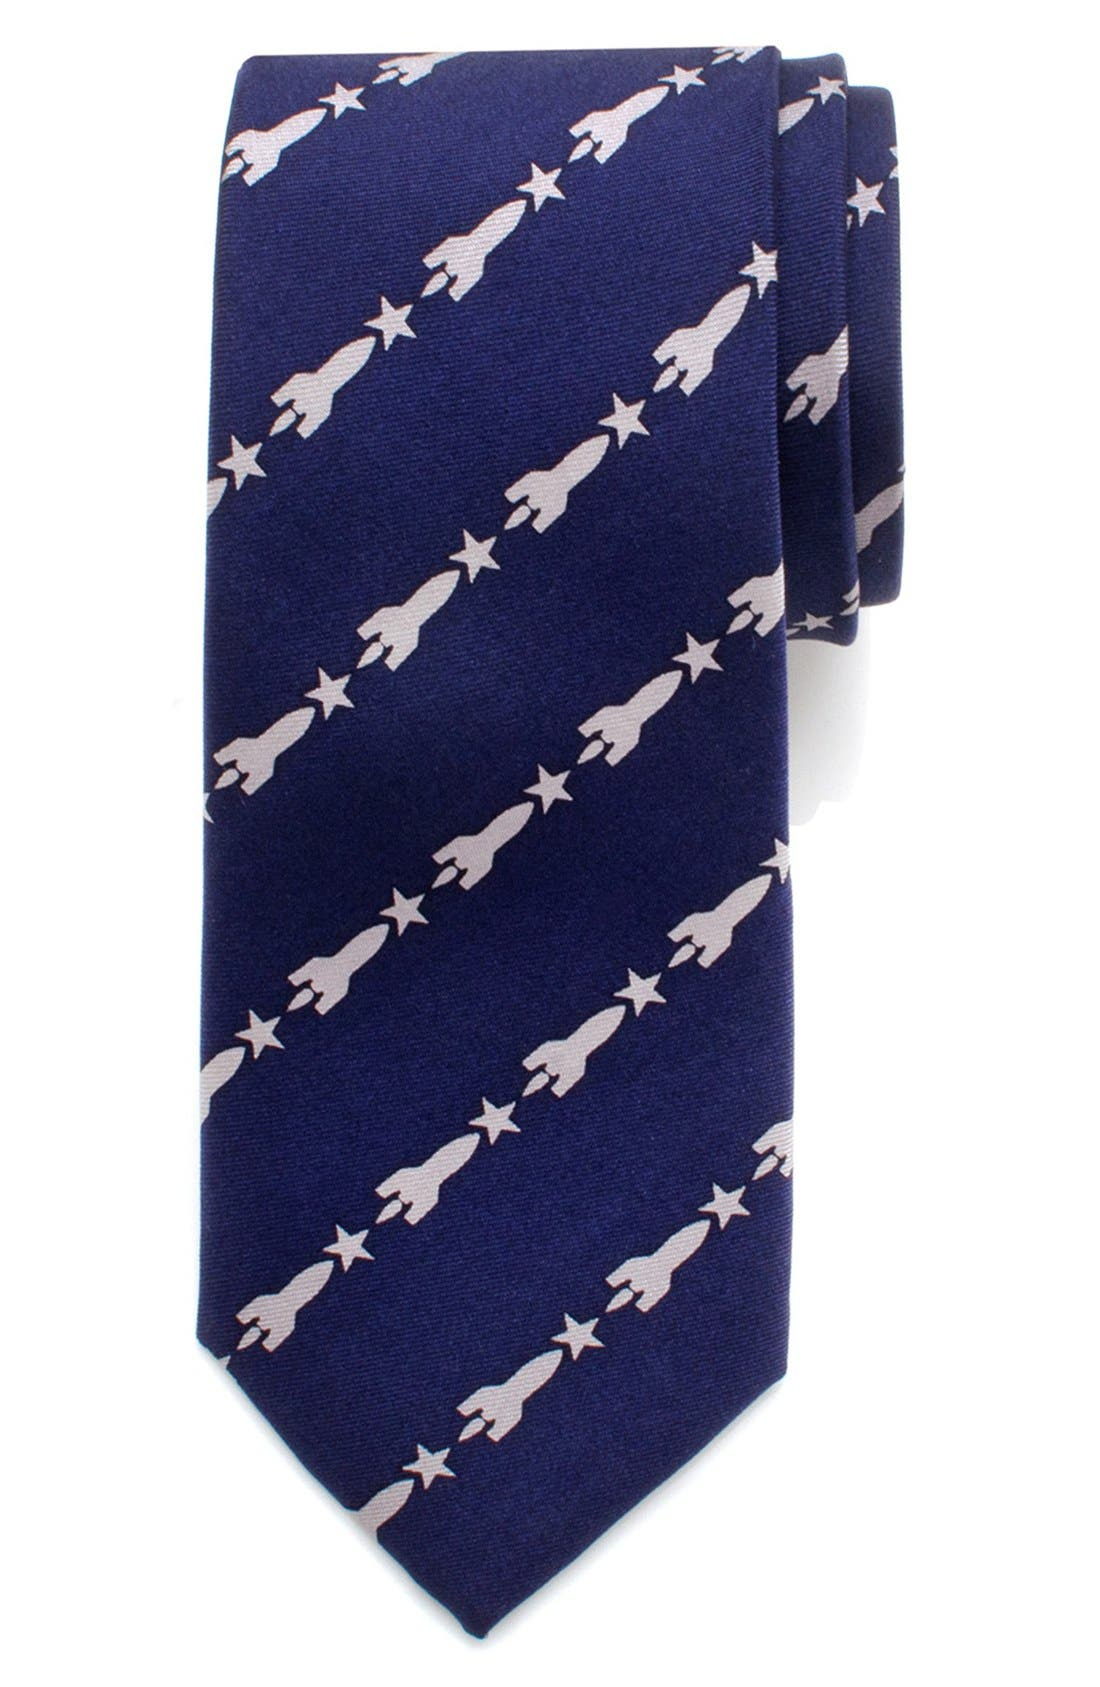 Ox and Bull Trading Co. 'Rockets & Stars' Silk Tie (Big Boys)